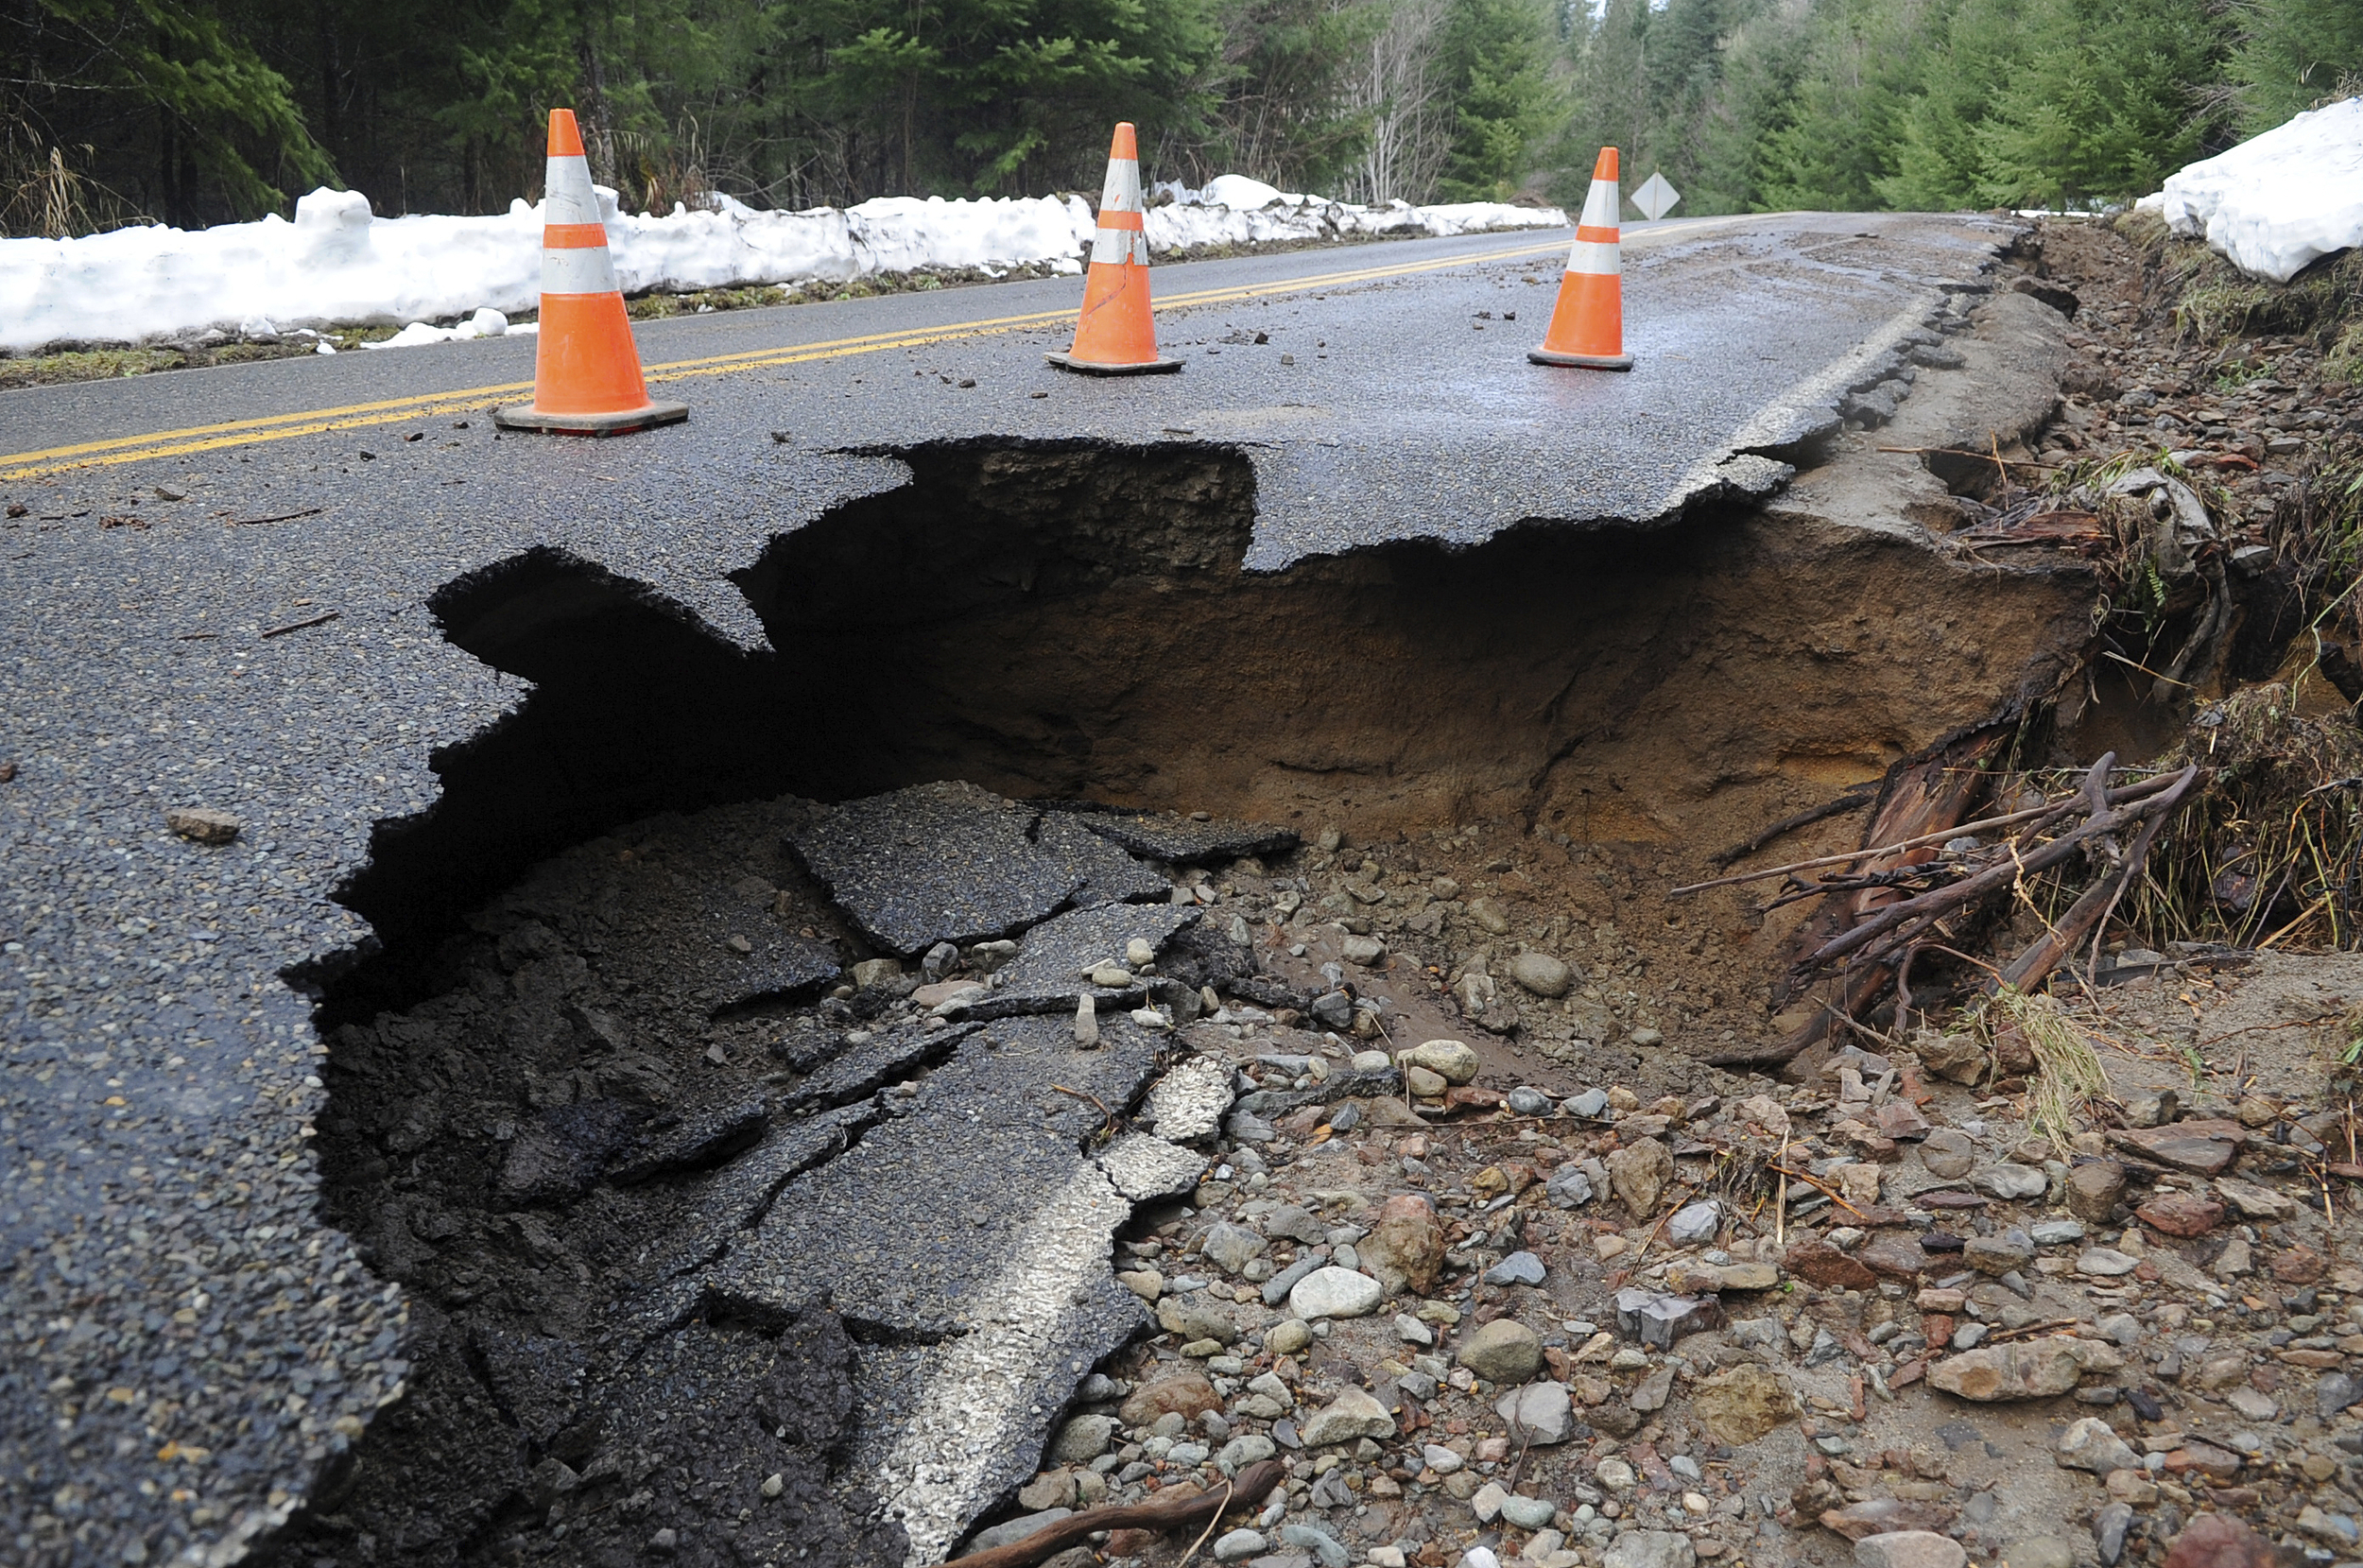 Sinkholes can be dangerous in many ways.